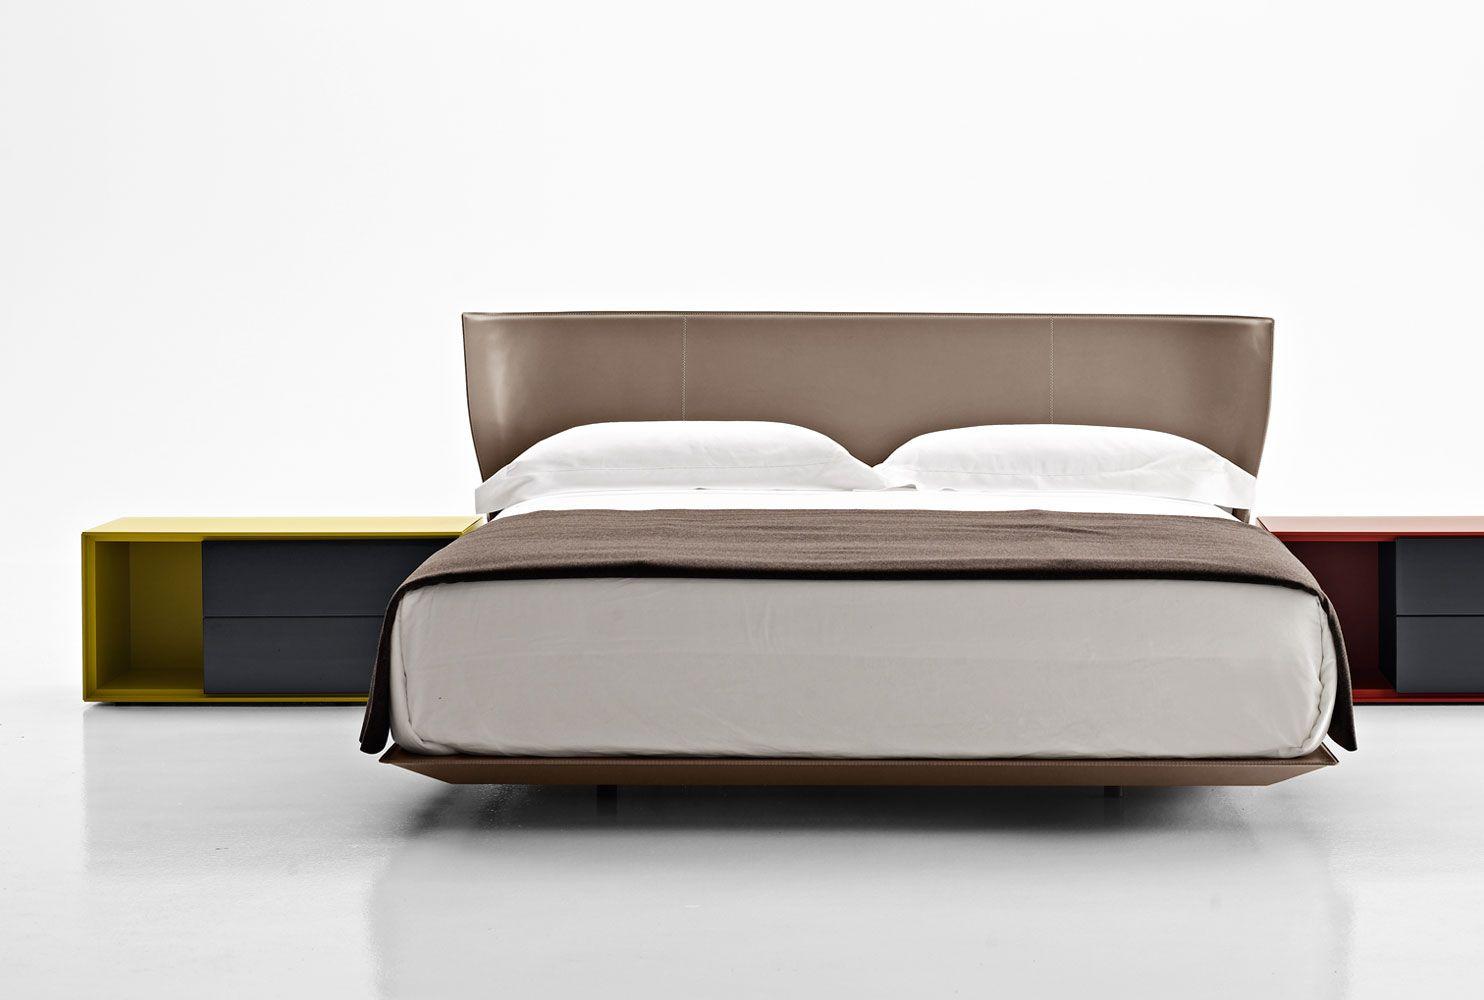 Husk bed b b italia buscar con google muebles for Bb italia muebles